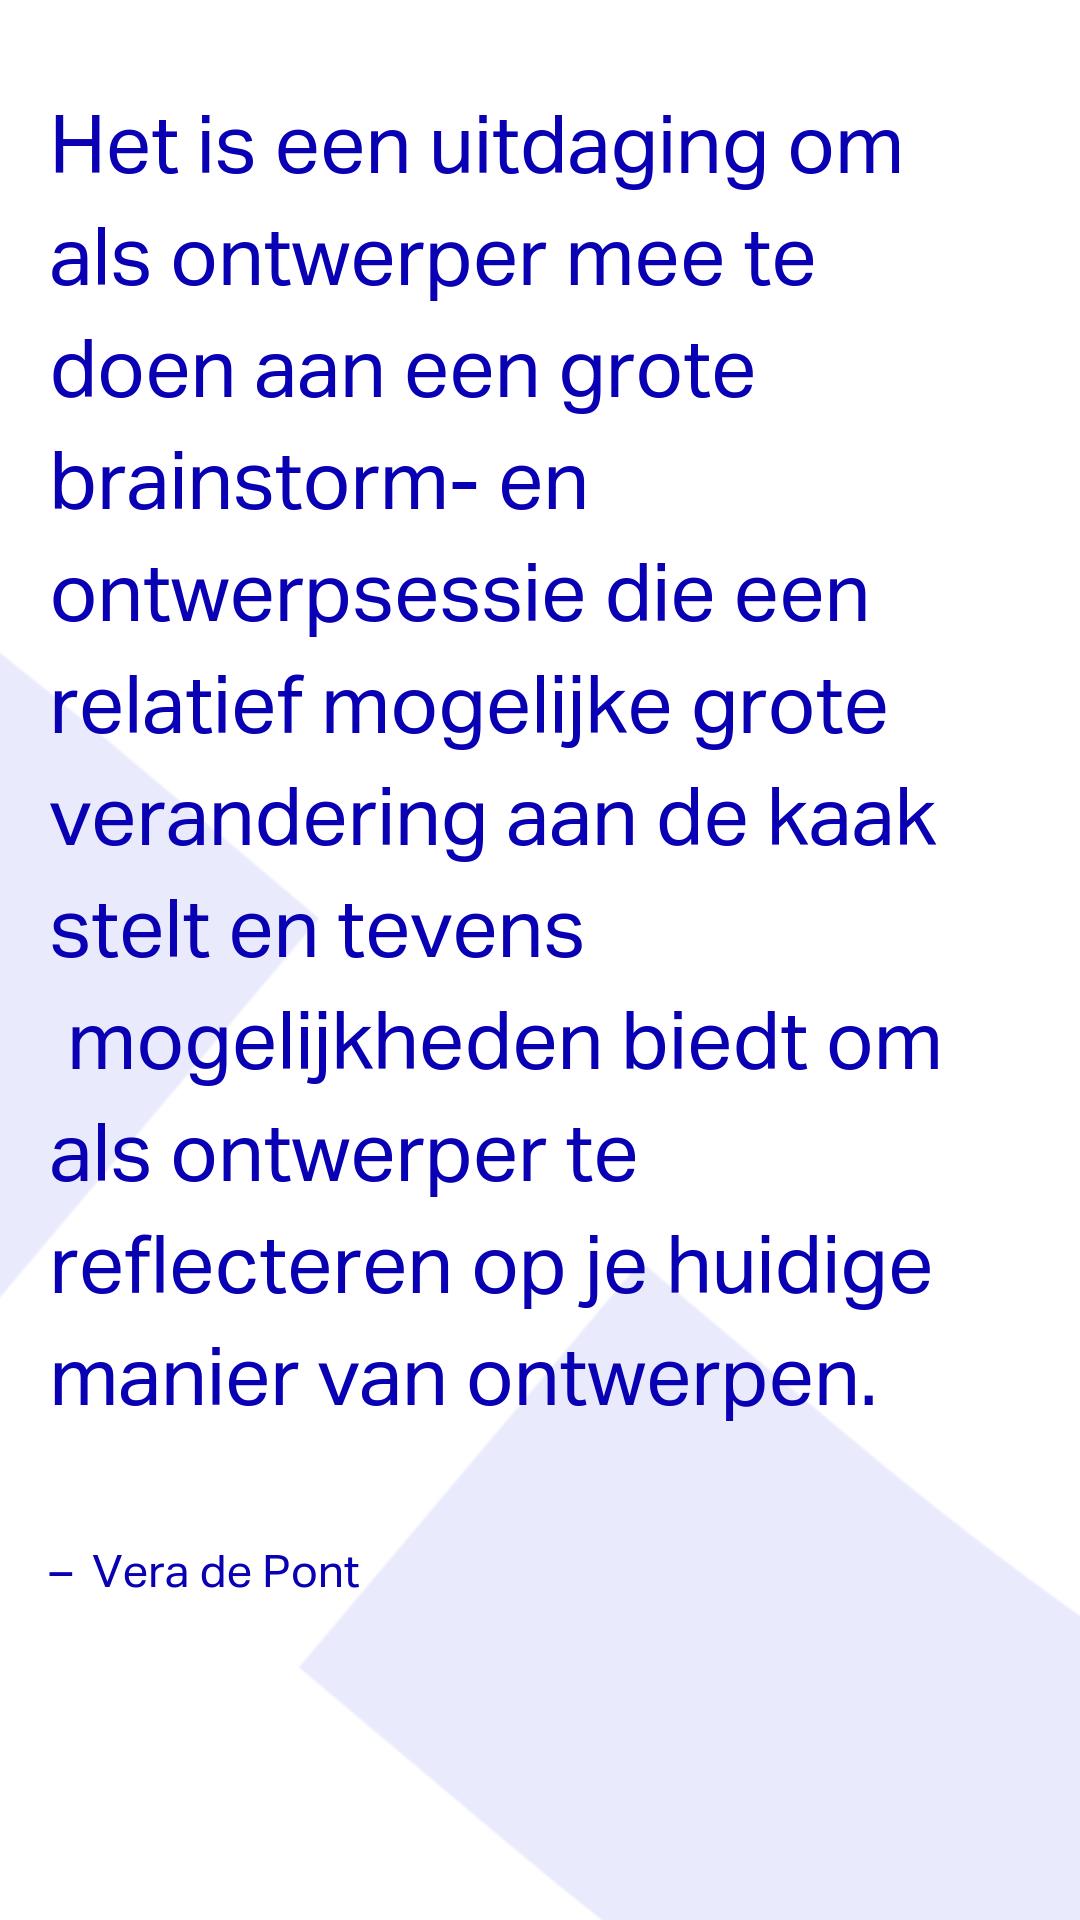 Taskforce-Fashion-Fashion-After-Flood-kennismaking-maastricht-Vera-de-Pont.png